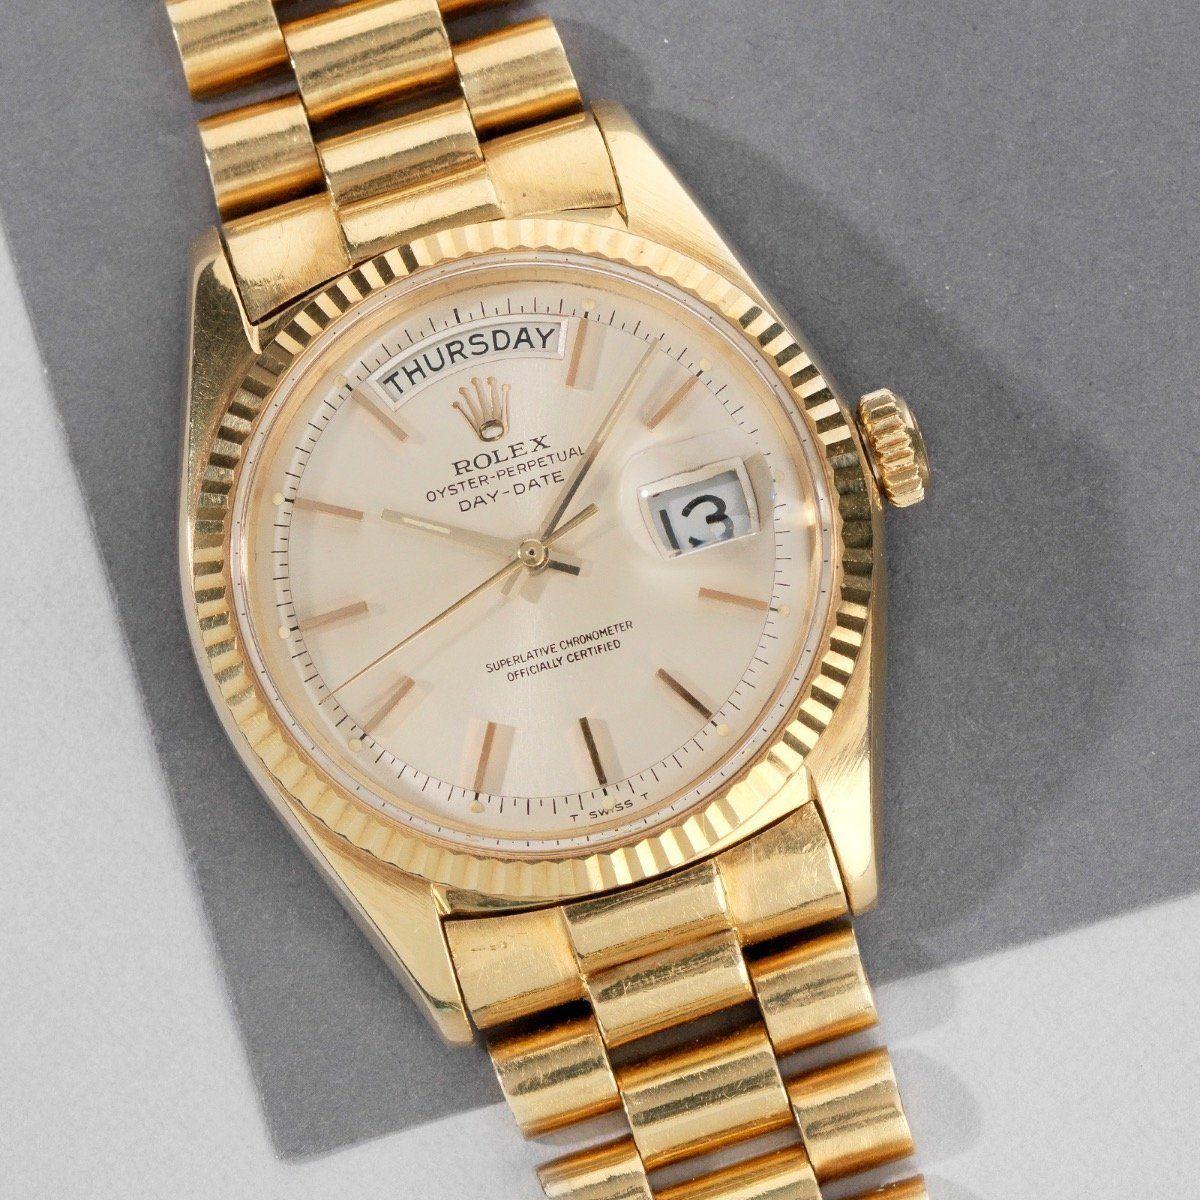 Rolex Day Date Silver Dial 1803 Rolex Day Date Rolex Vintage Timepiece